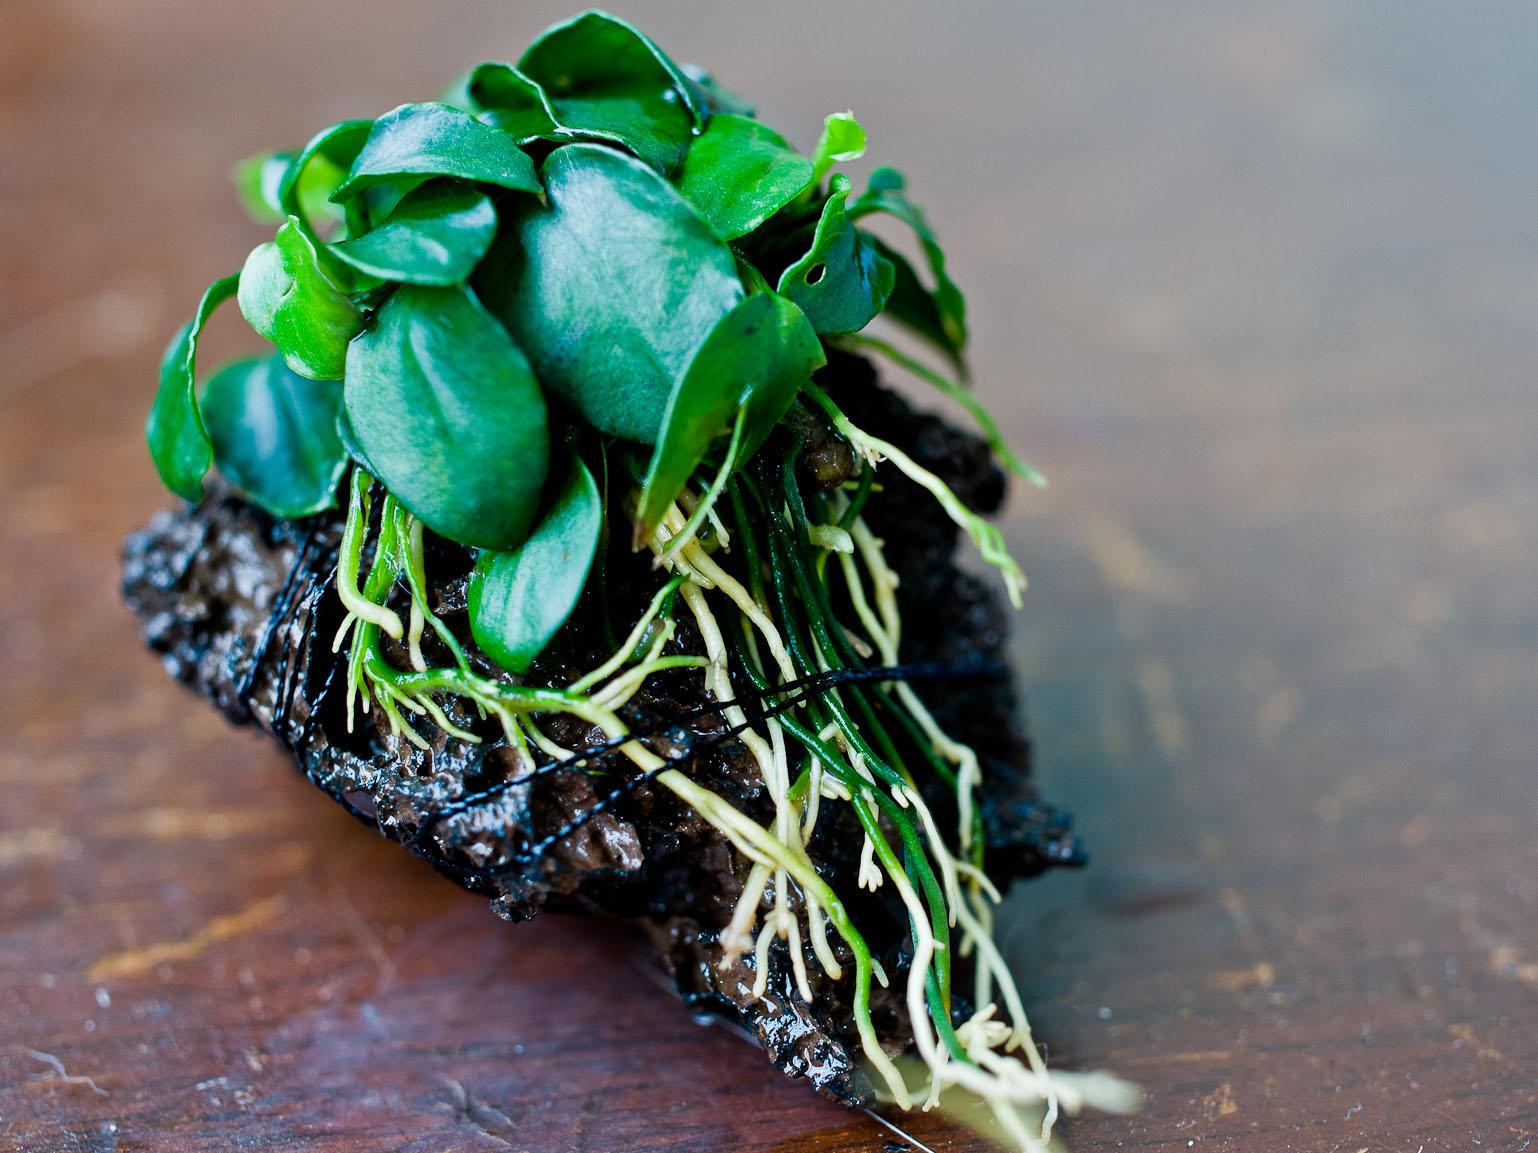 new aquarium plants anubias barteri var nana petite aquascape